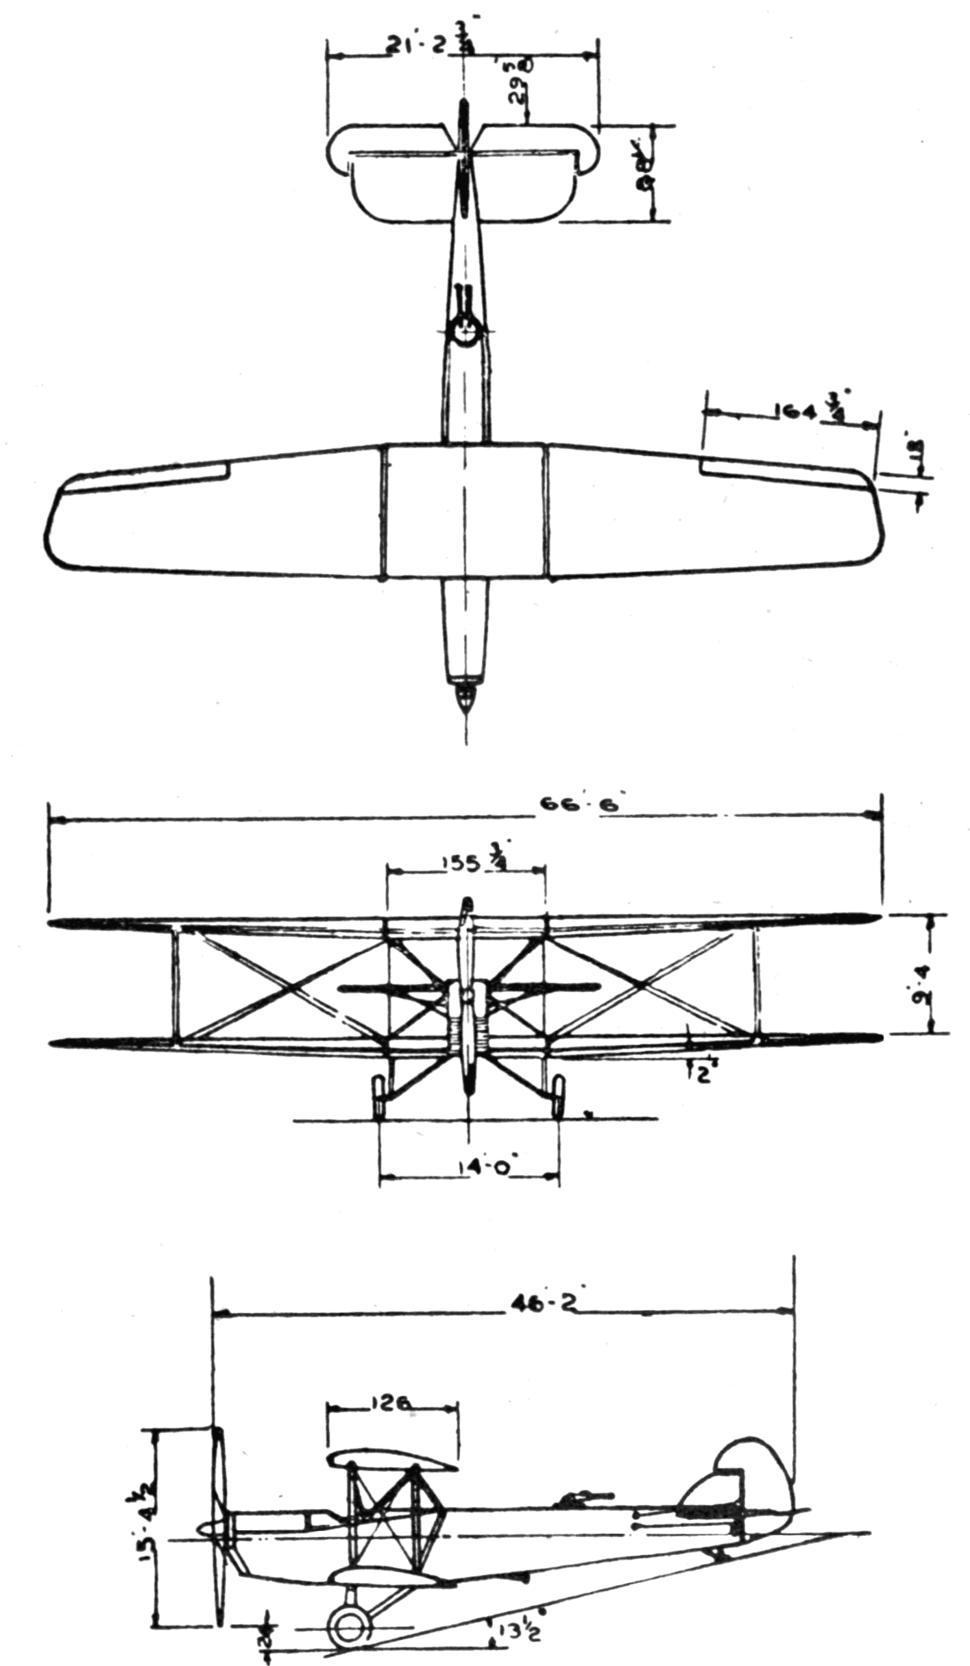 Huff Daland XLB-1 3-view L'Air September 15,1926